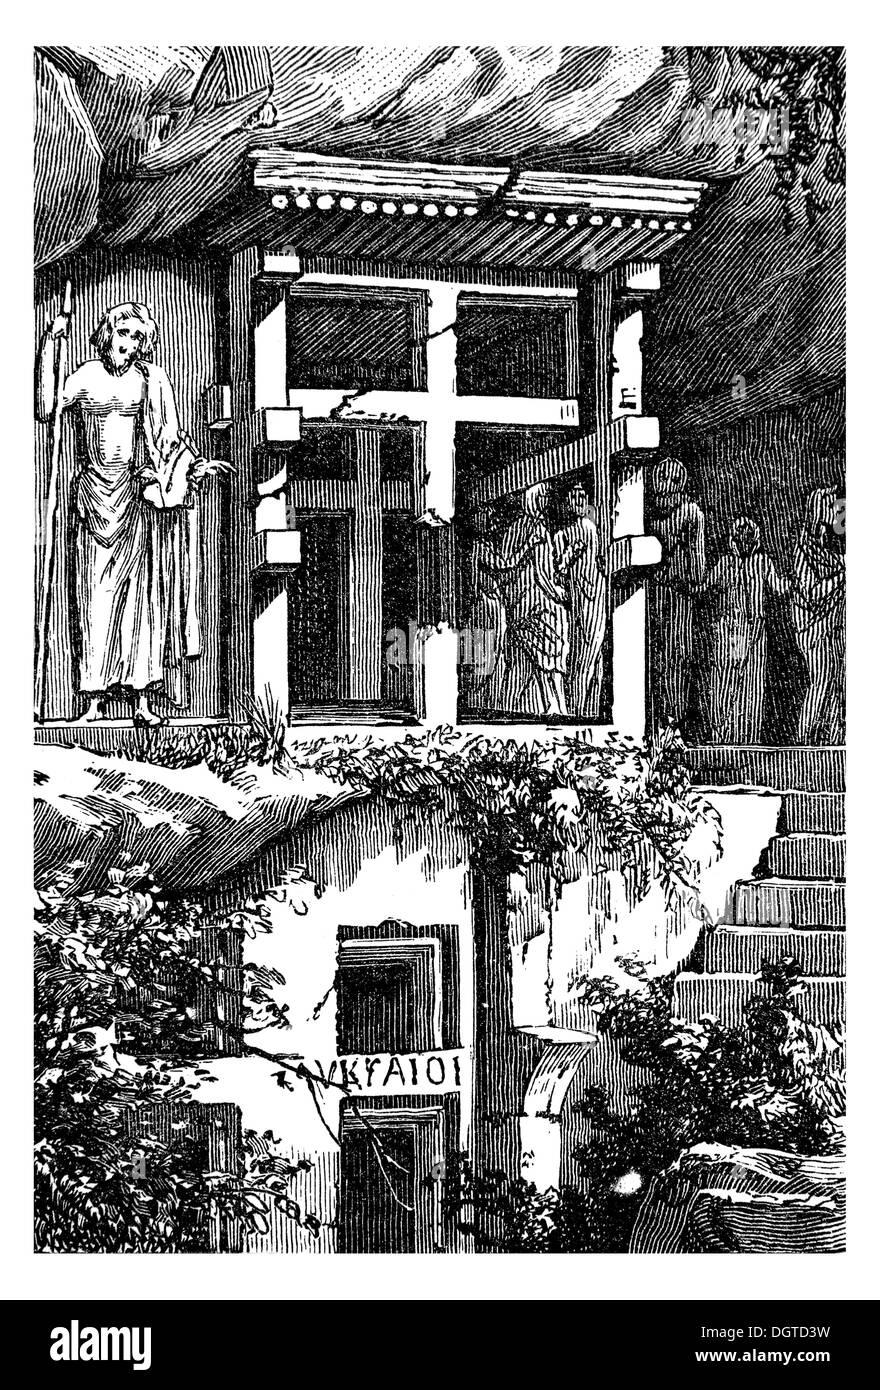 Lycian Tombs of Antiphellos, Asia Minor, about 400 BC to 300 AD, illustration, Meyers Konversations-Lexikon encyclopedia, 1897 - Stock Image